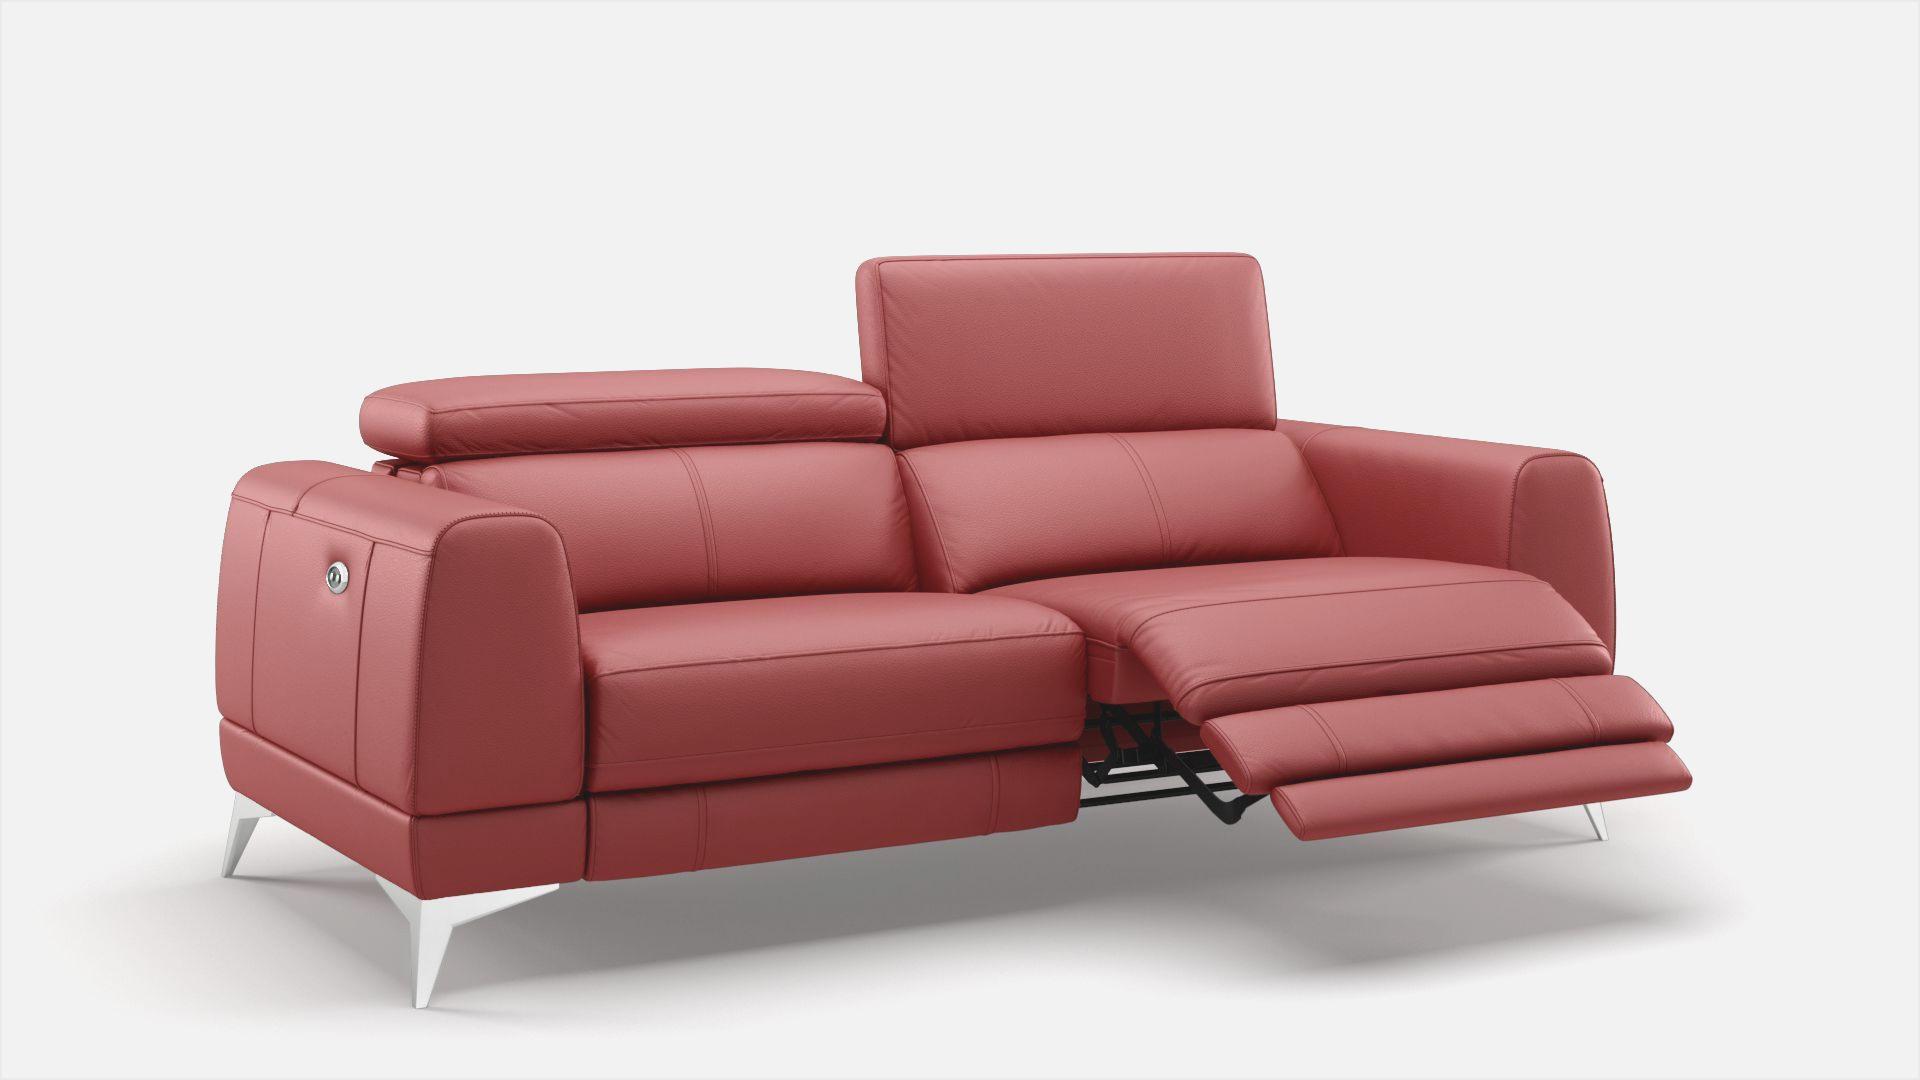 Full Size of Couch Relaxfunktion Günstiges Sofa Eck Liege Sitzsack Regal Mit Schubladen Schillig Bett 180x200 Zweisitzer Beleuchtung 3er Grau Big Schlaffunktion 3 Sitzer Sofa 3 Sitzer Sofa Mit Relaxfunktion